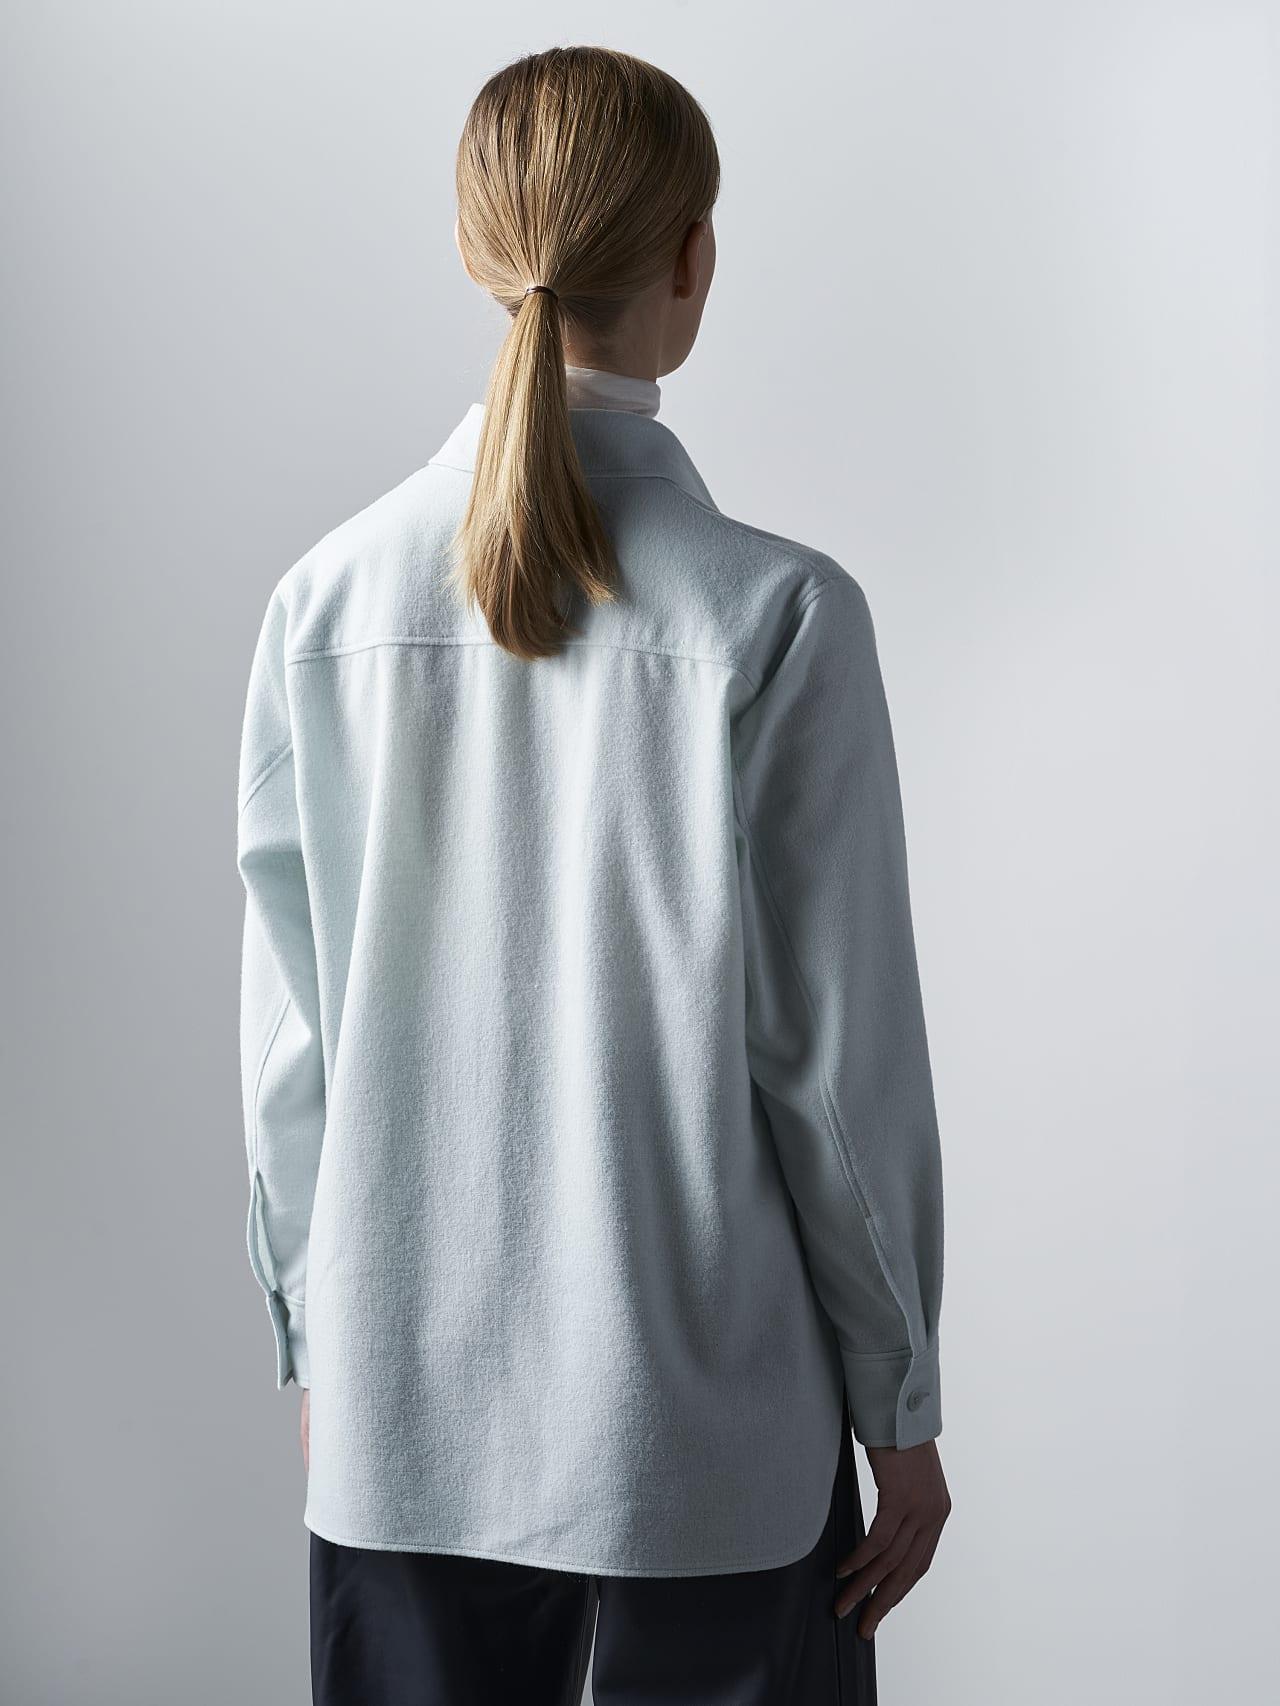 WOVIE V1.Y5.02 Wool Over-Shirt Pale Blue  Front Main Alpha Tauri